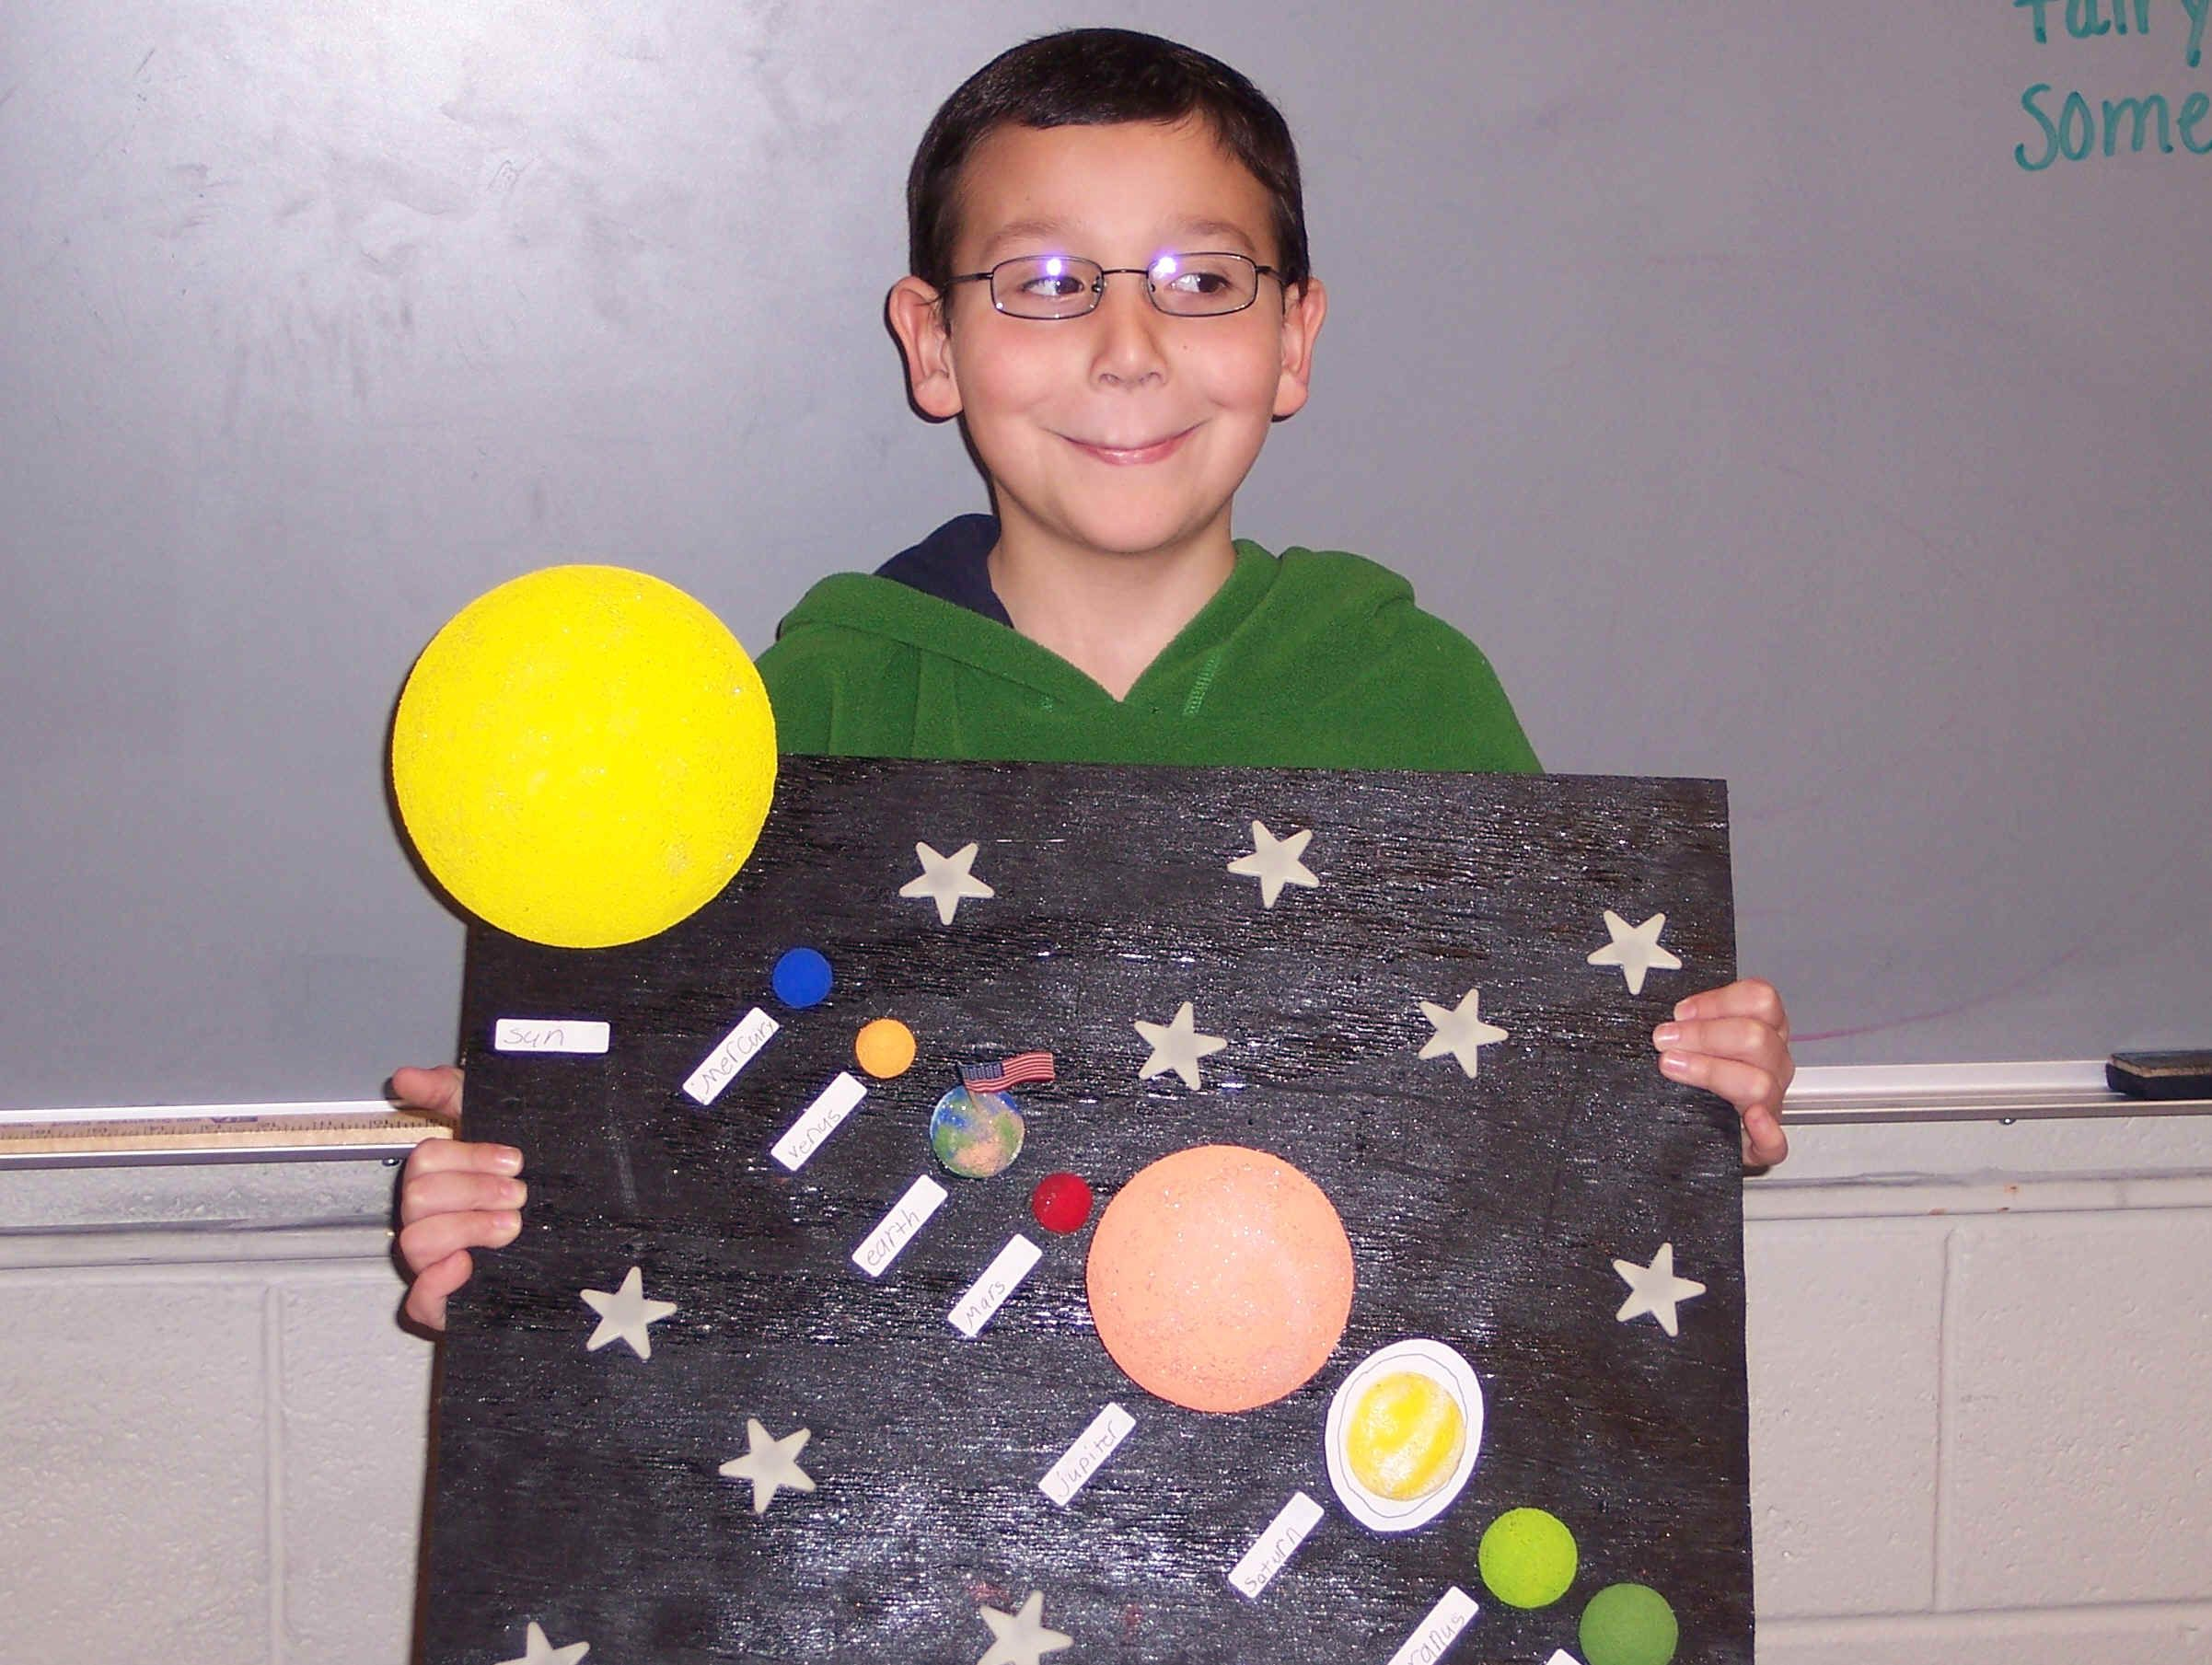 Solar System Diorama Project